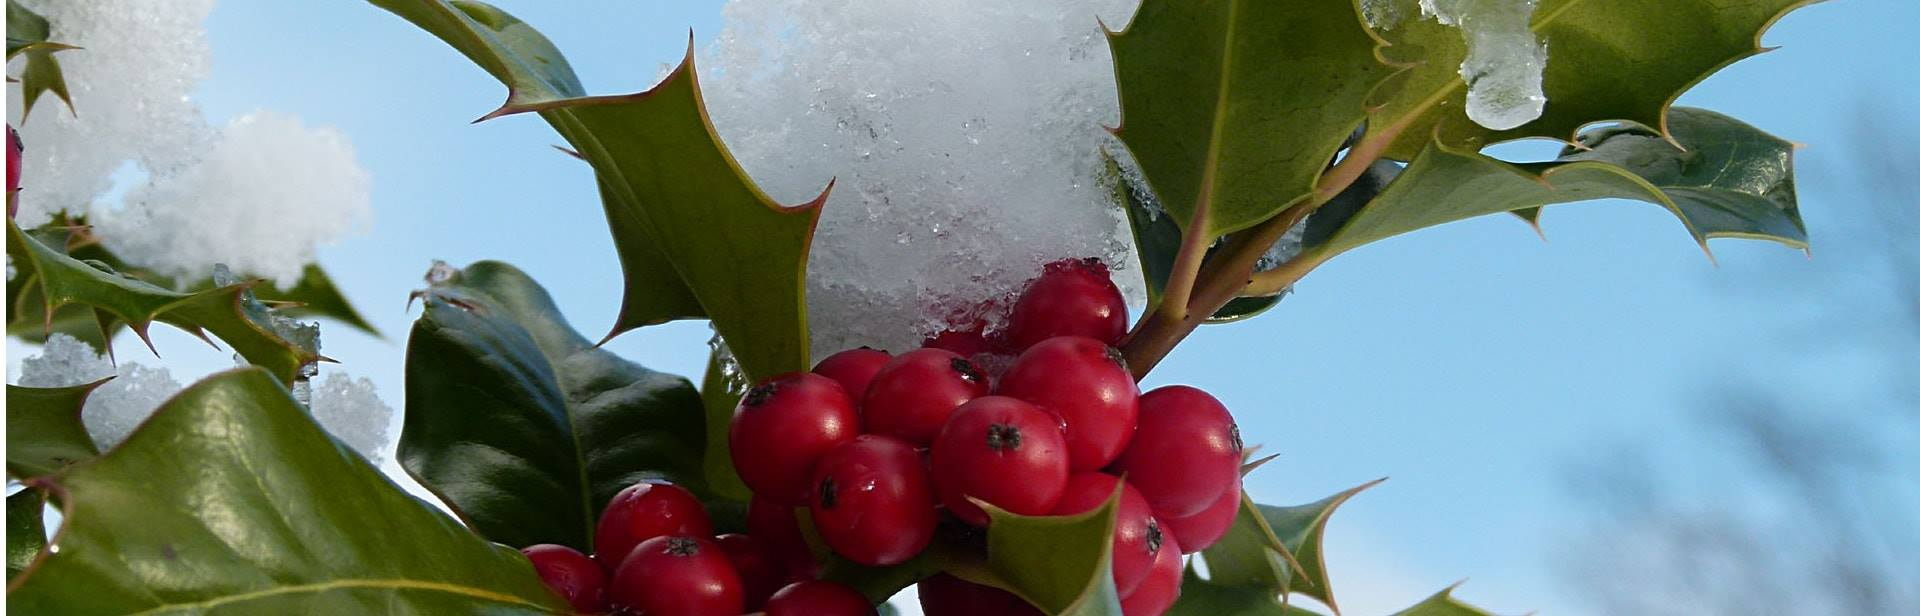 Conseils bulle de vert paysagiste caluire et cuire for Jardinier paysagiste lyon